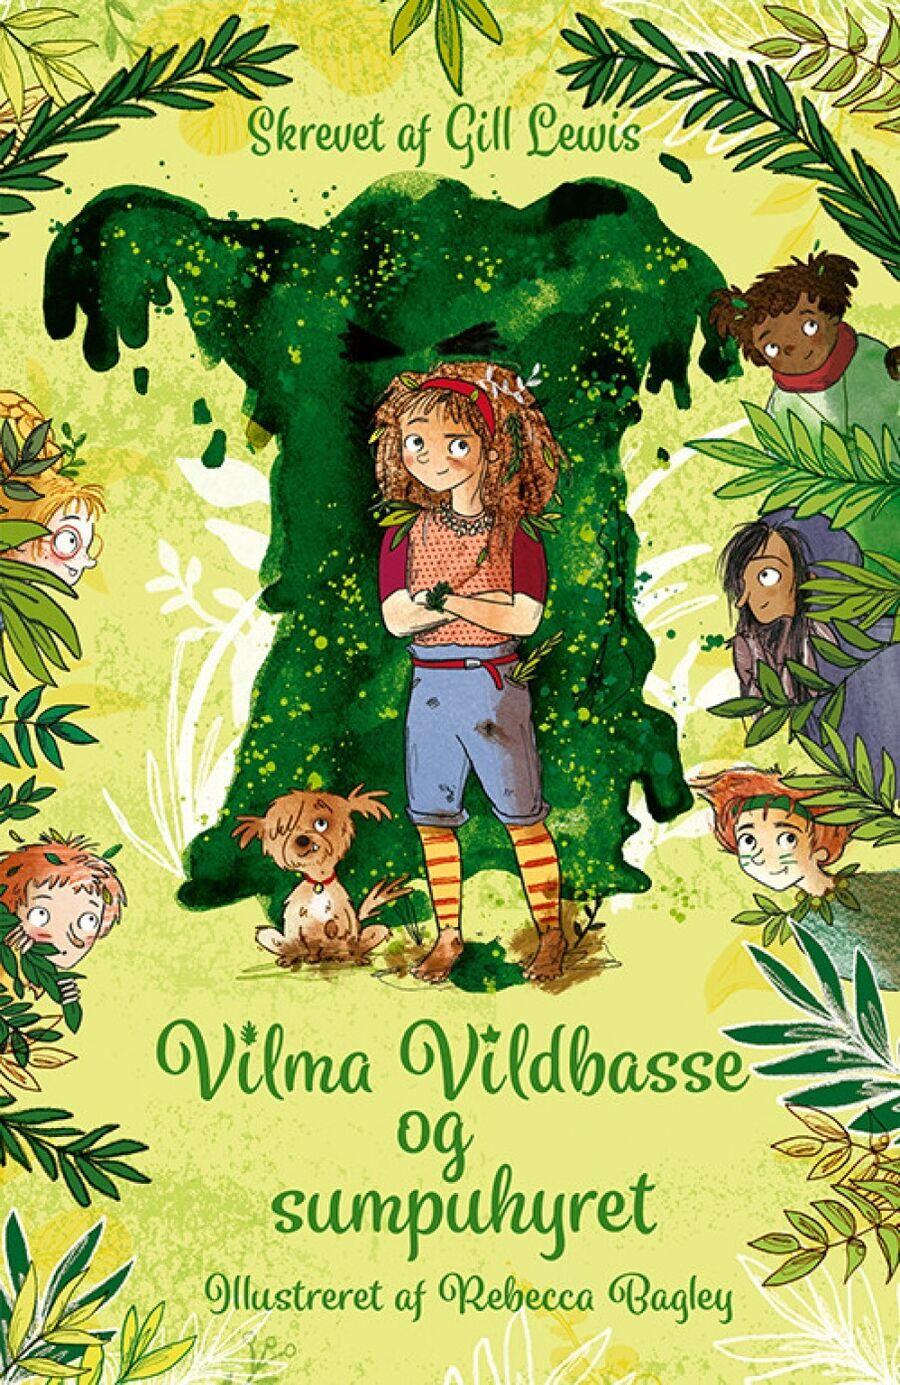 Vilma Vildbasse og sumpuhyret